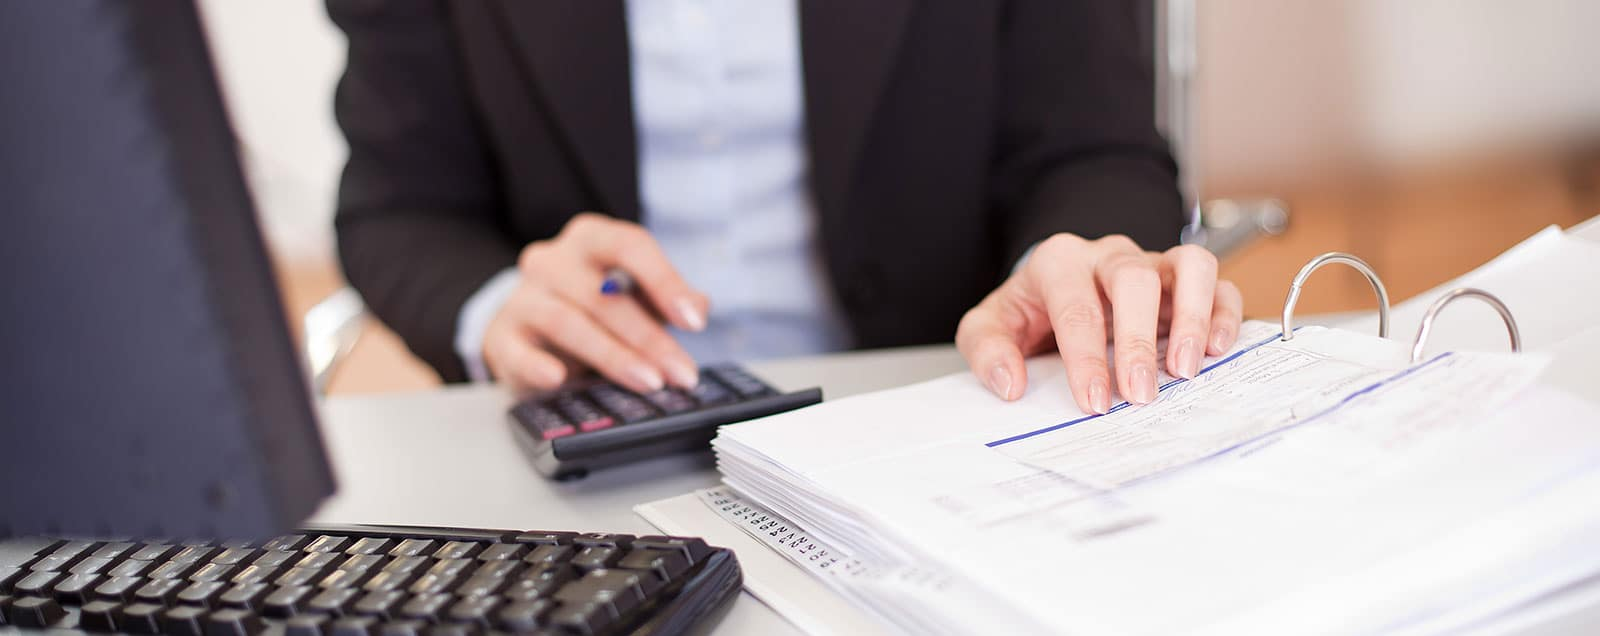 financing car loan paperwork